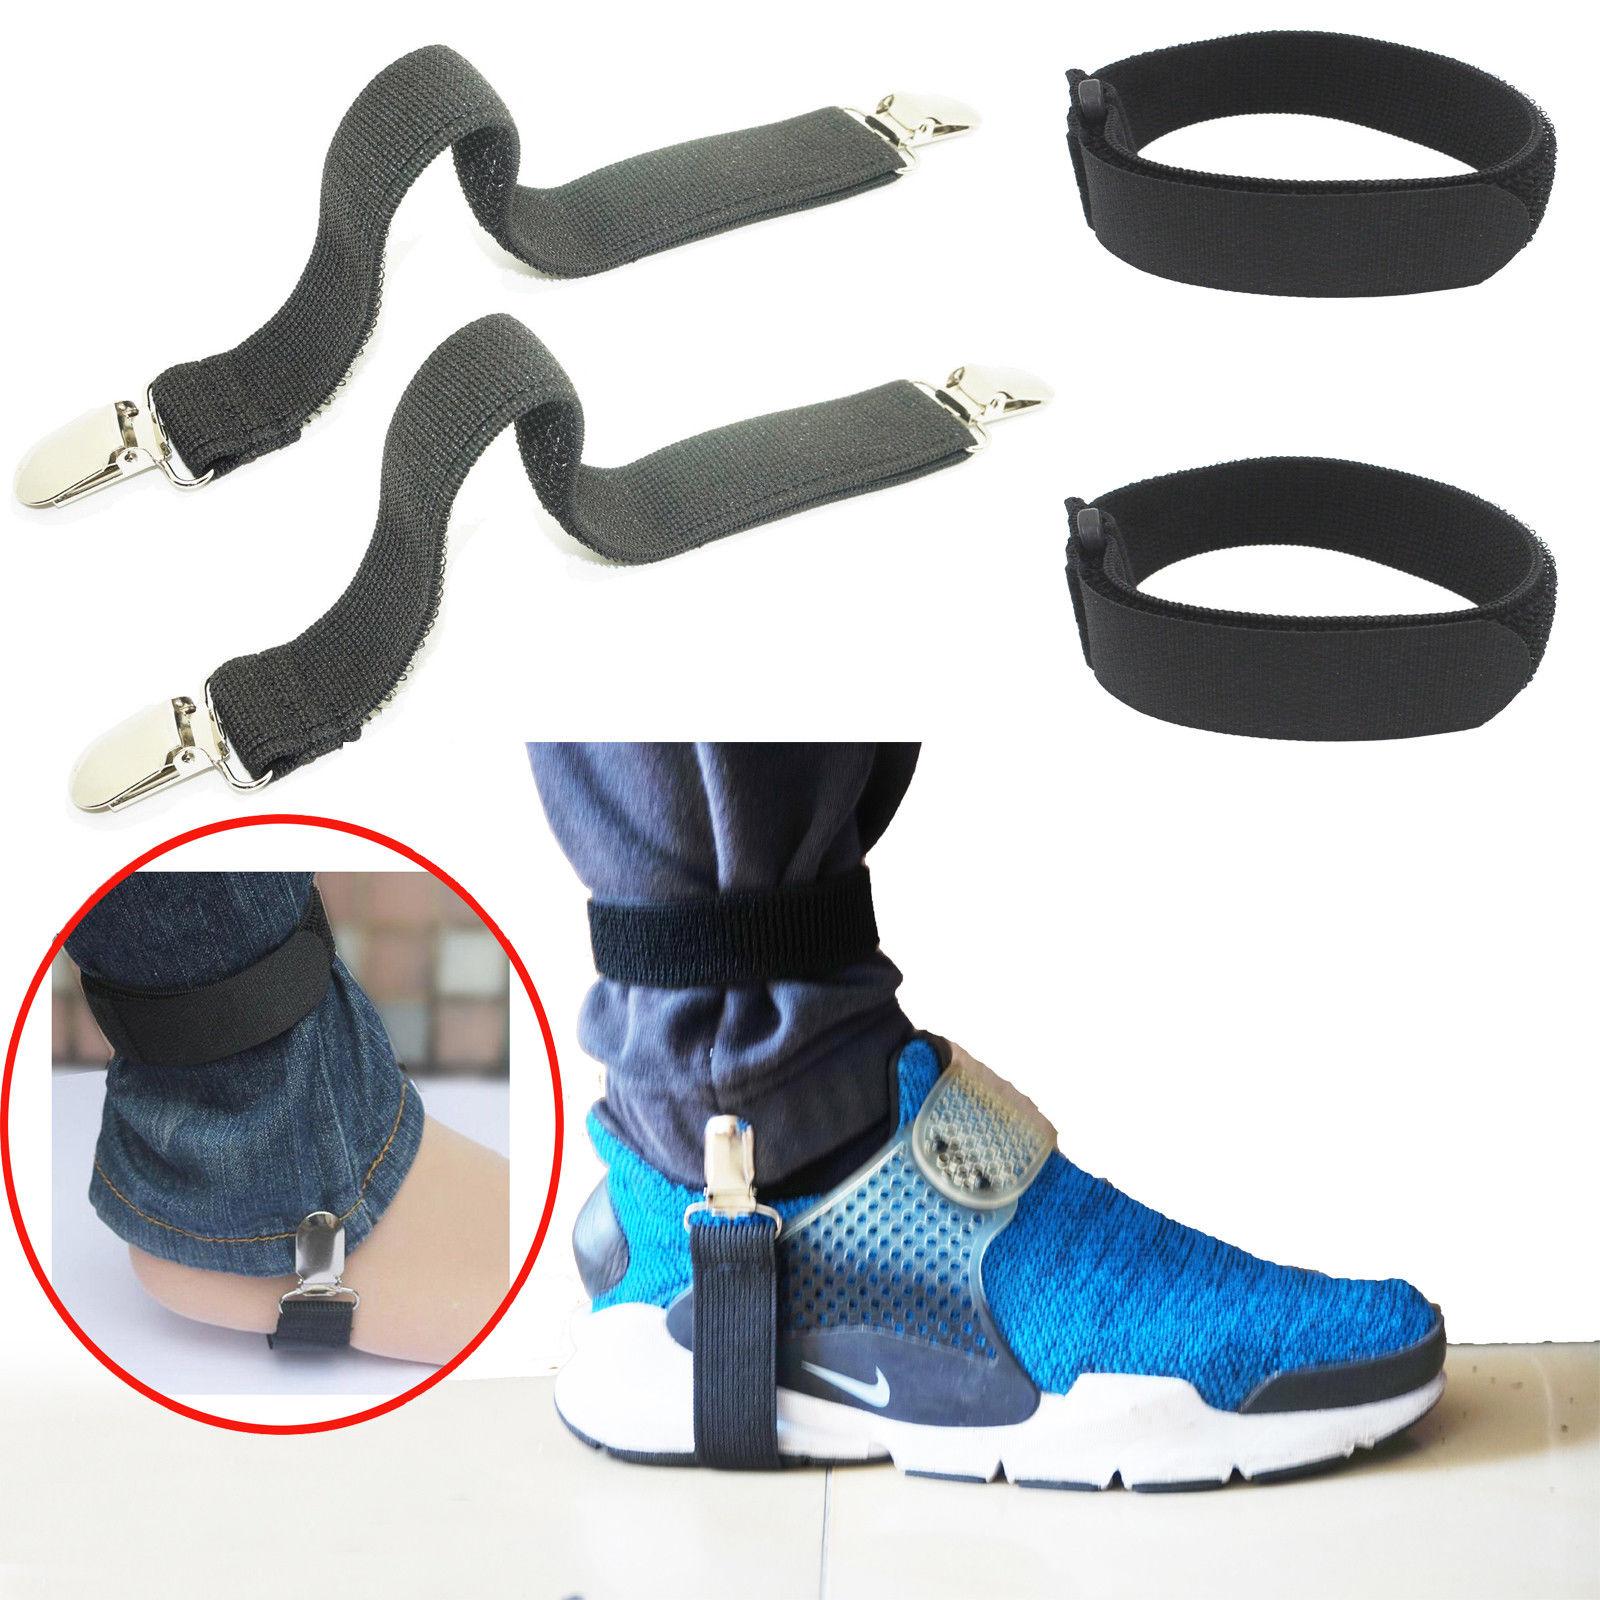 US 4PCS Motorcycle Bike Stirrup Pant Clips Leg Boot Elastic Adjustable Straps